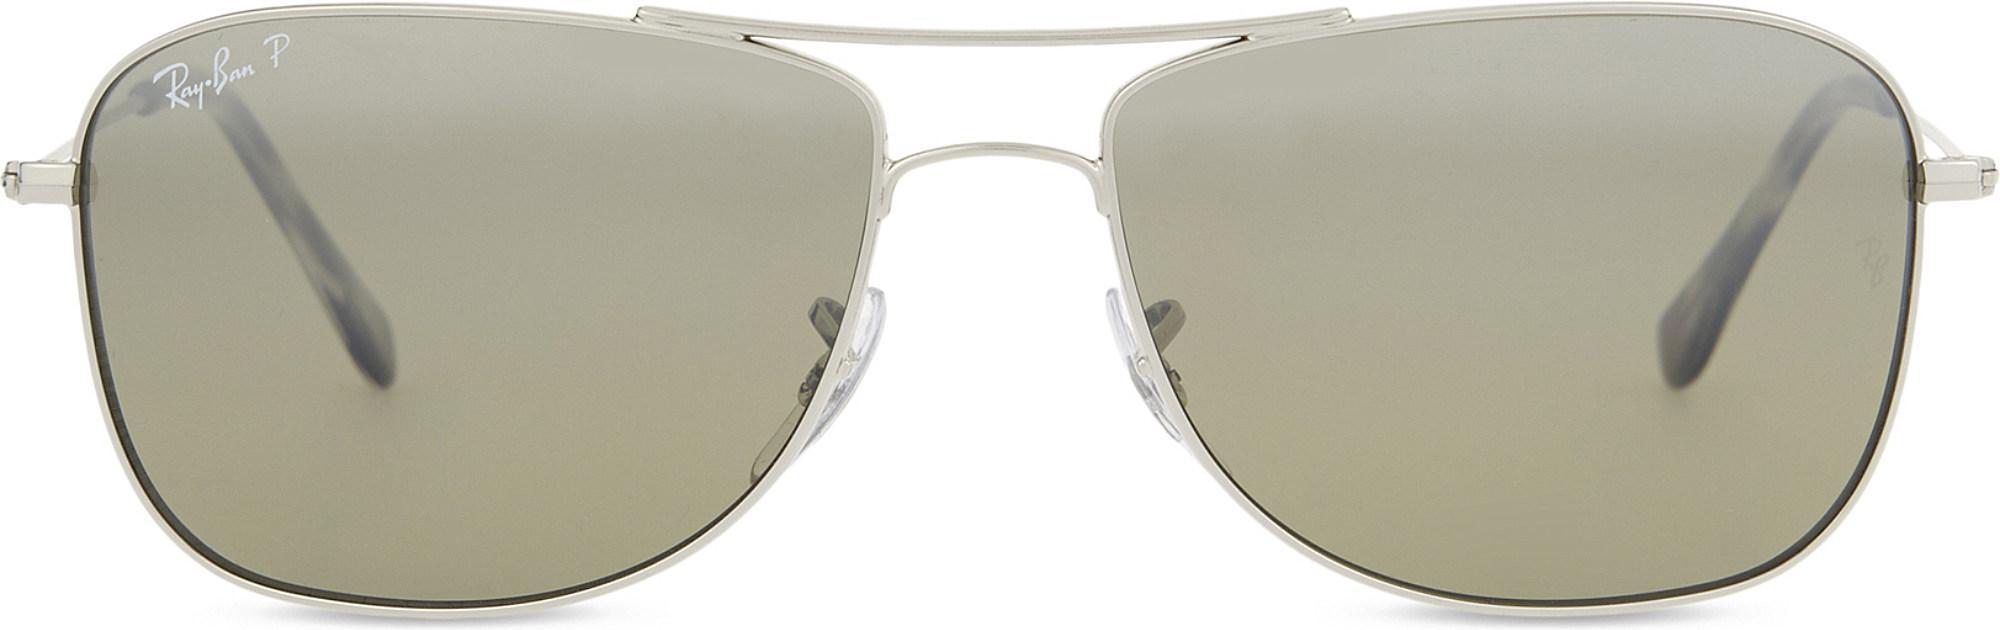 17936052244 Lyst - Ray-Ban Rb3543 Chromance Aviator Sunglasses in Metallic for Men